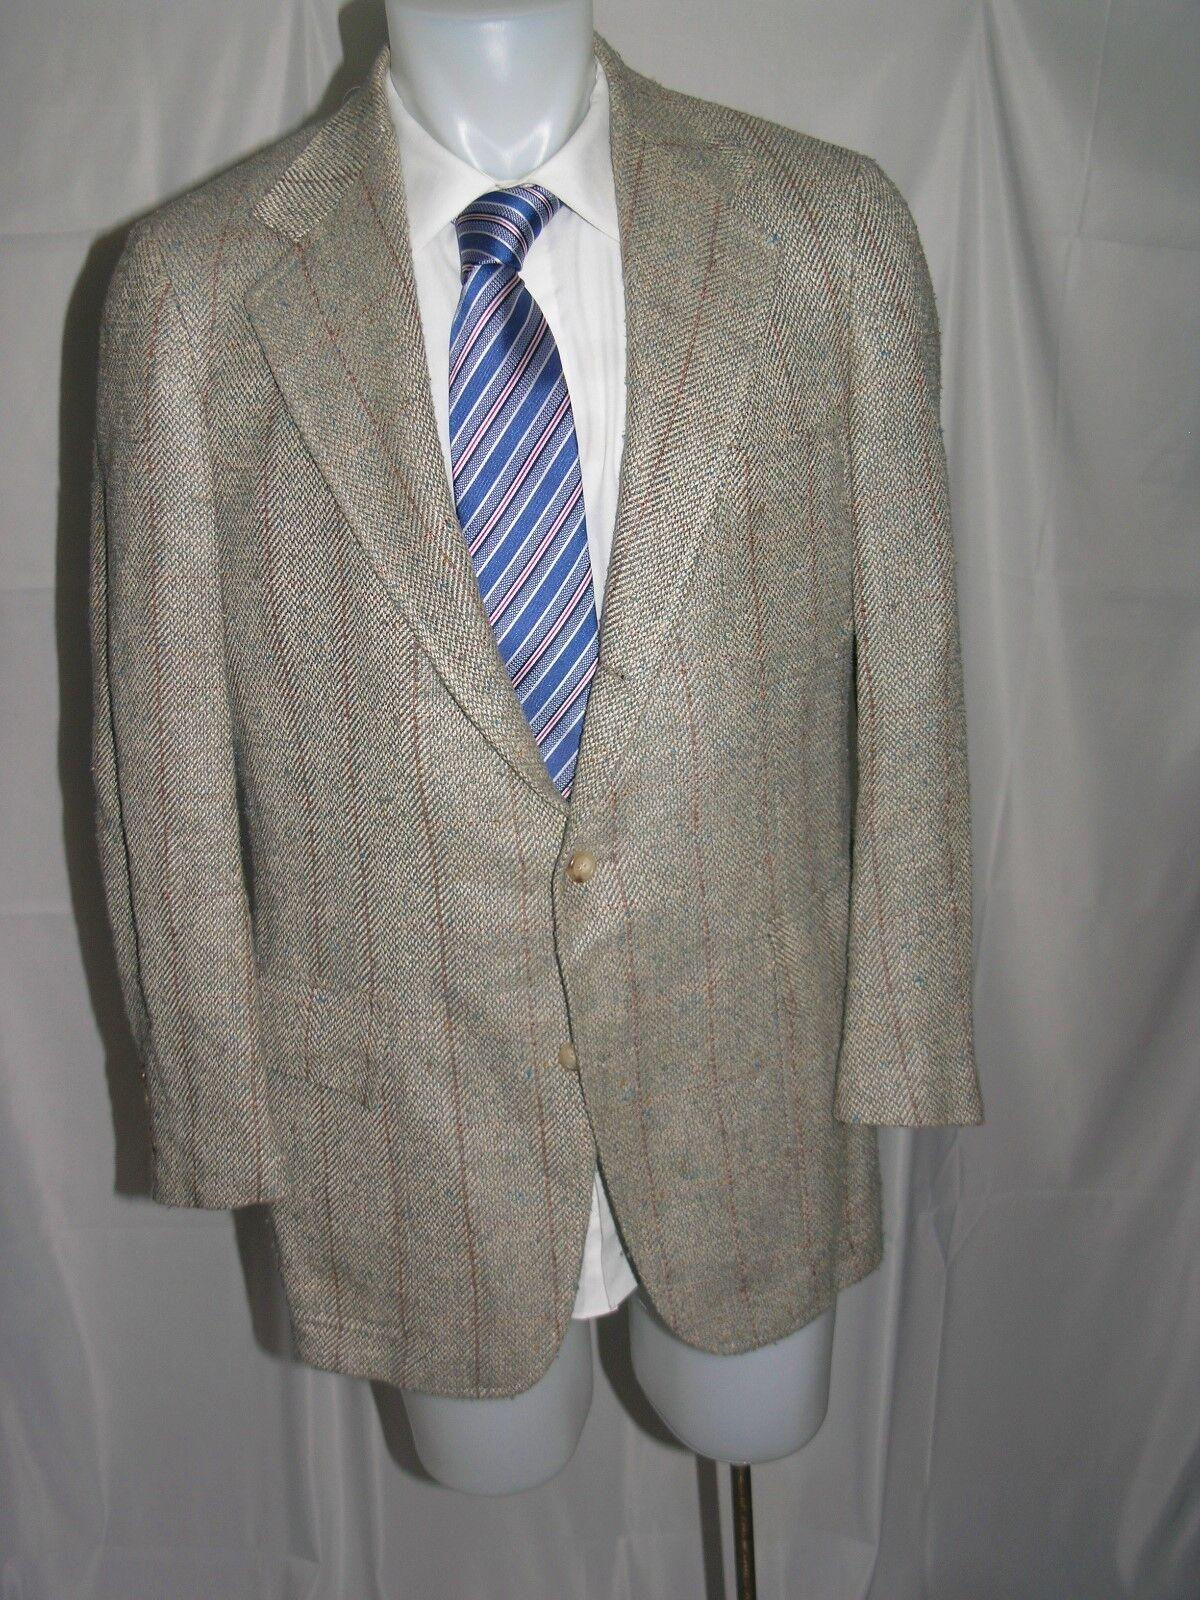 Polo Ralph Lauren bluee Label Vintage Three Roll Two Tweed Blazer 42 L